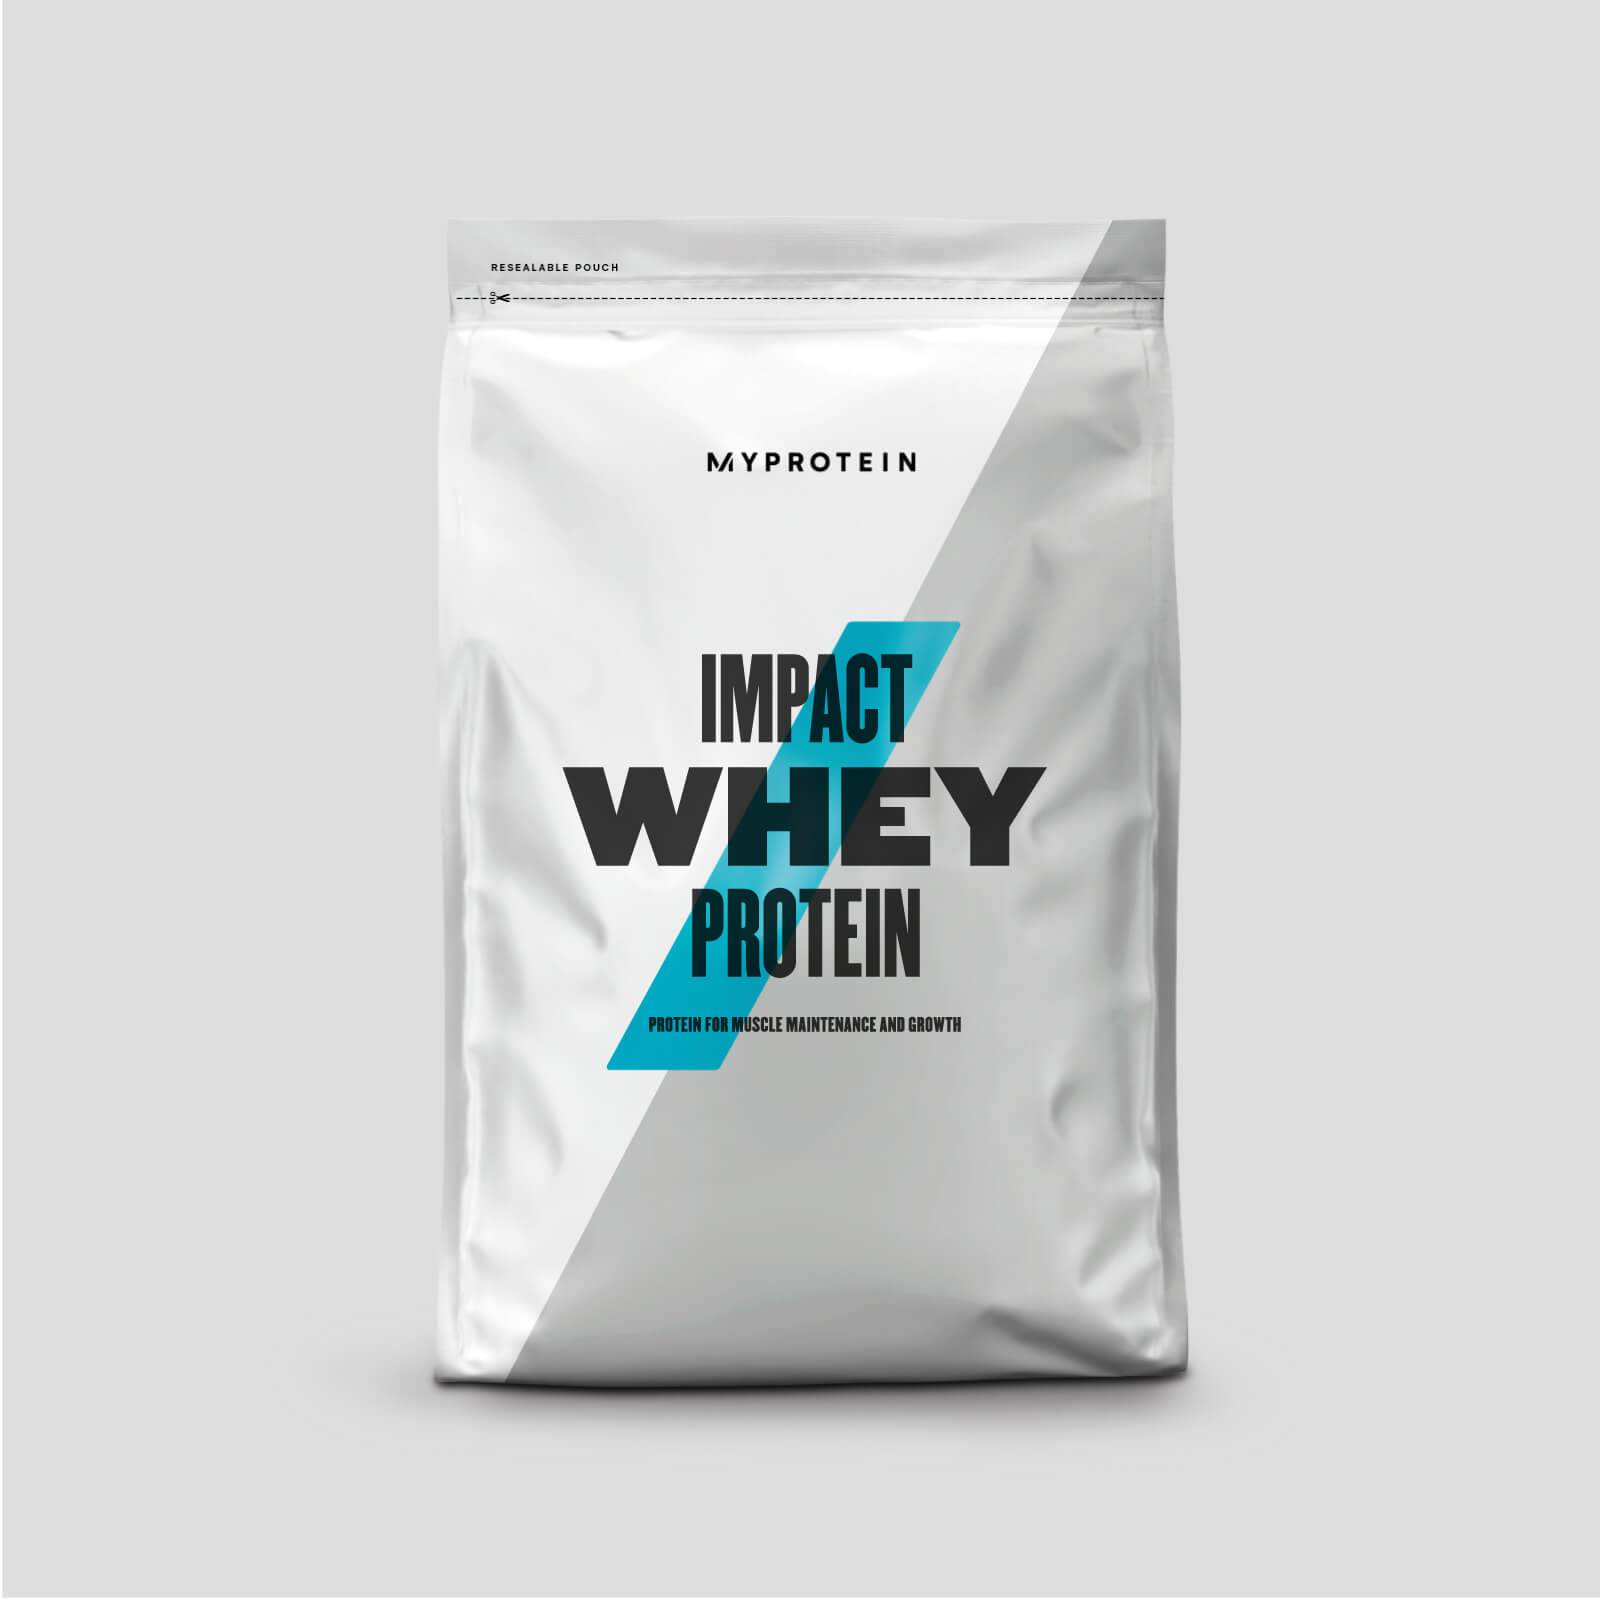 Myprotein Impact Whey Protein - 1kg - Noix chocolat